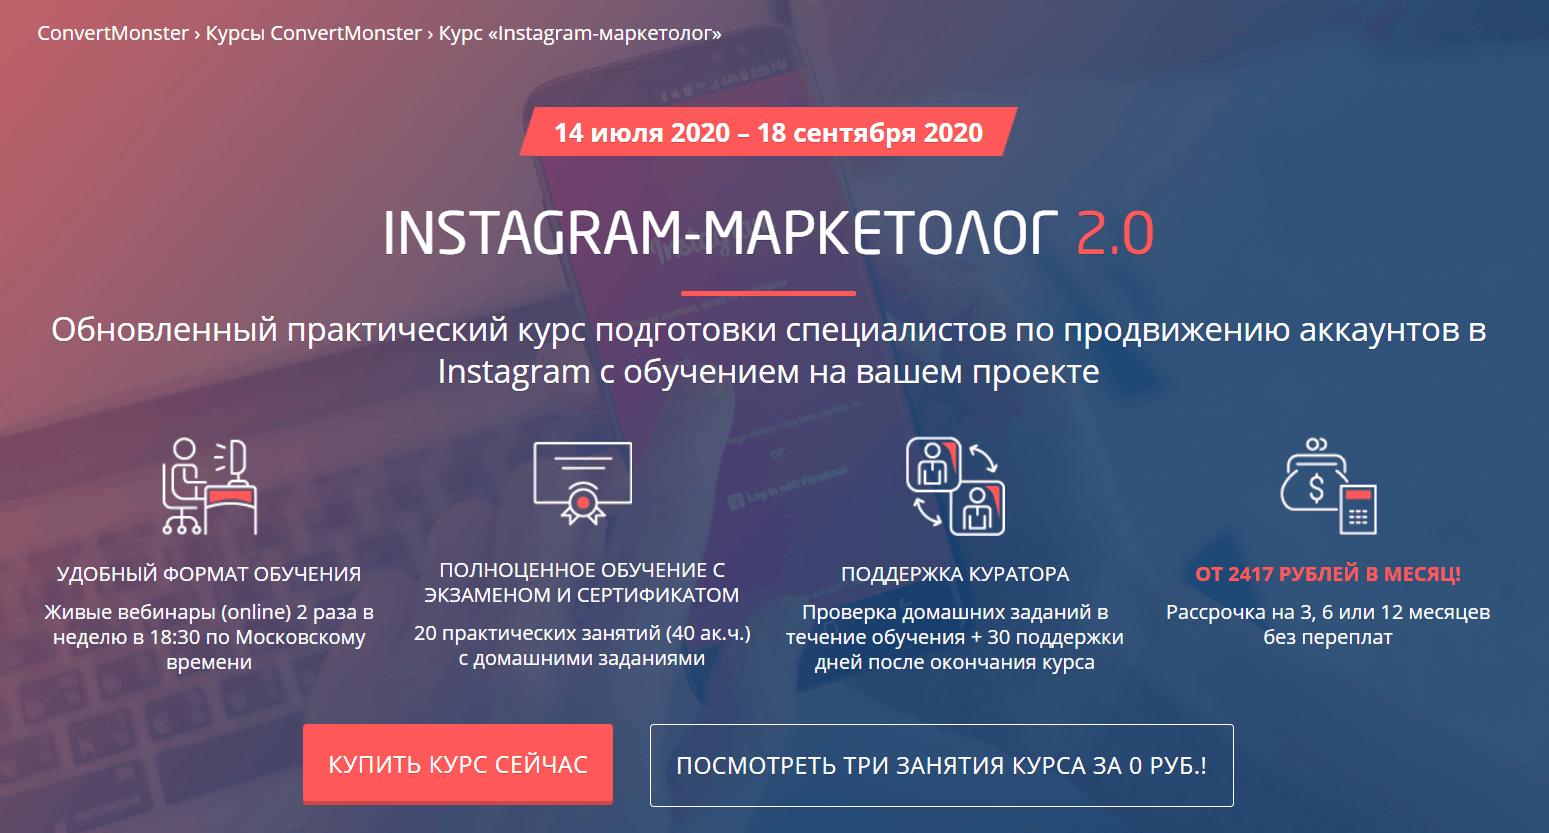 Instagram-маркетолог от ConvertMonster